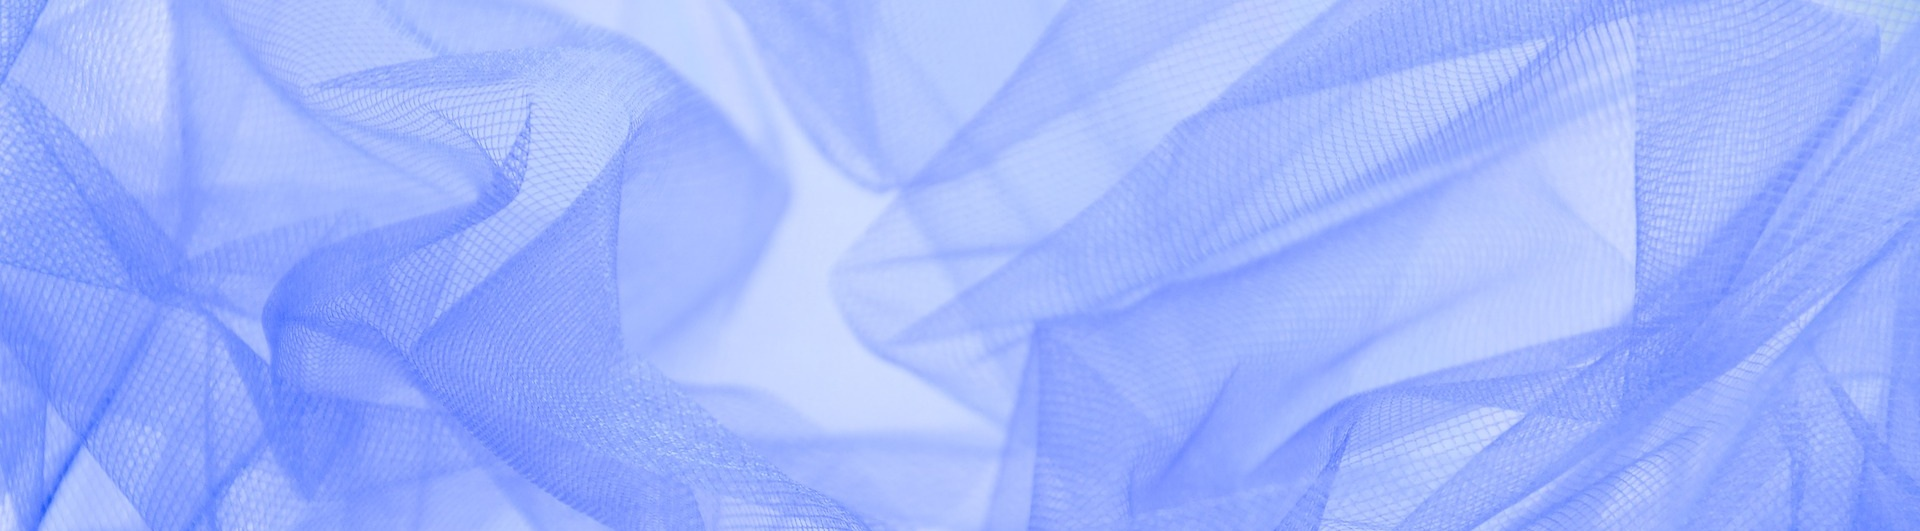 texture-4131279_1920.jpg